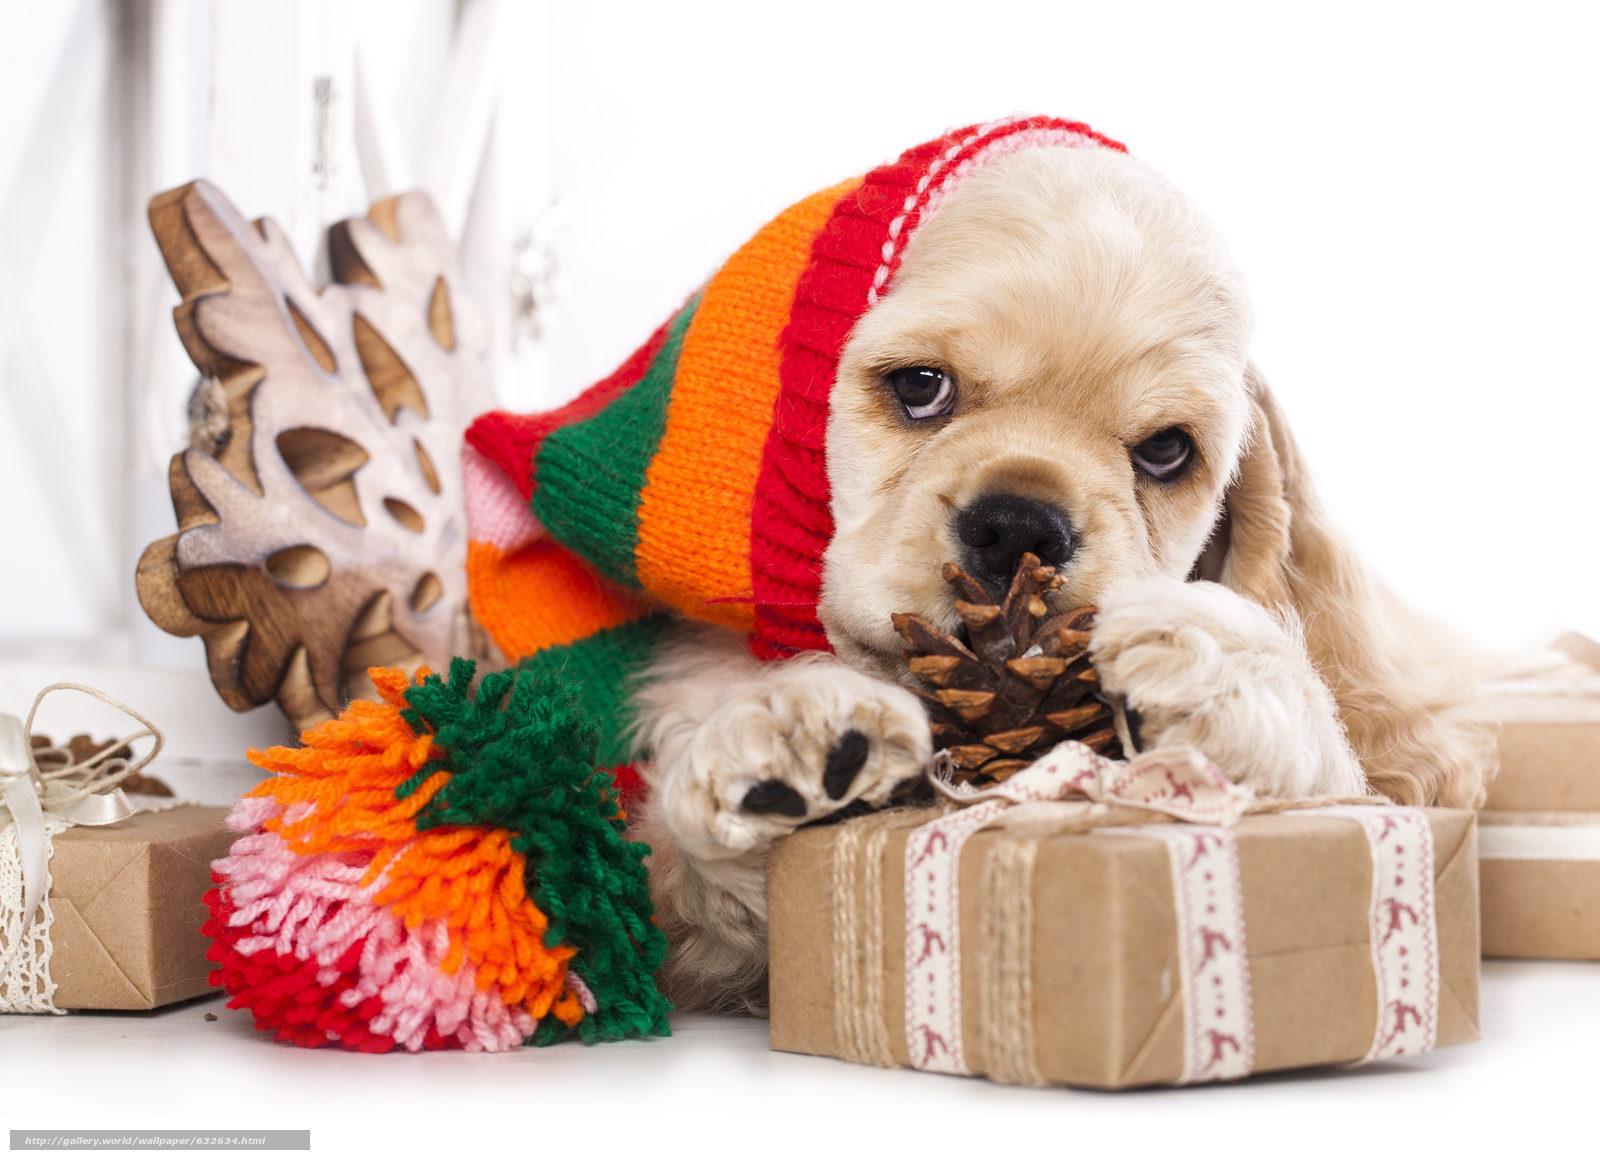 Pink Wallpaper With Cute Puppy Golden Retriever Бесплатные новогодние обои 2018 собаки собачки и щенки